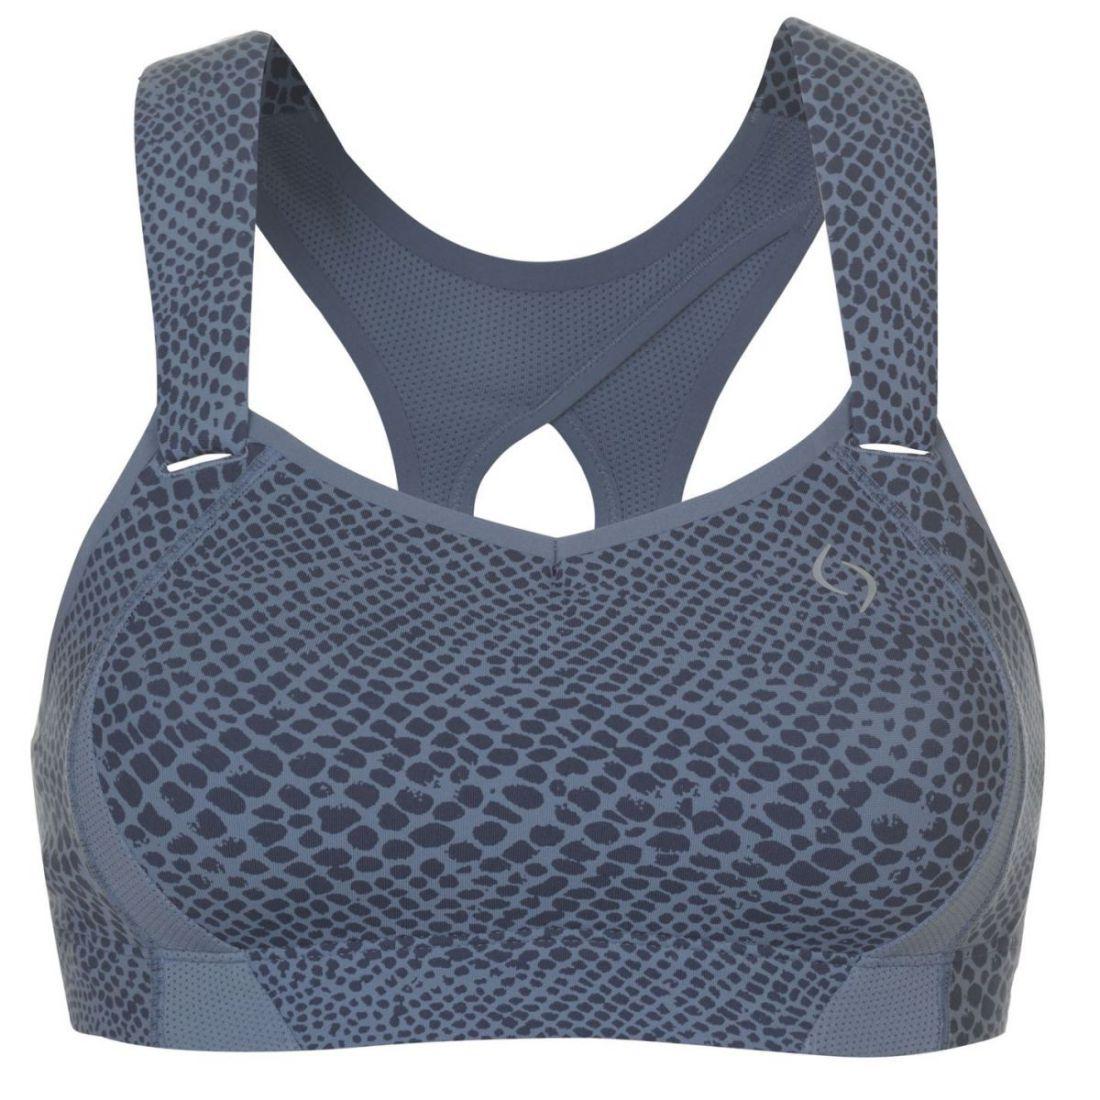 d408370c343f8 Image is loading Brooks-Moving-Comfort-Juno-Athletic-Bra-Ladies-Ventilated-